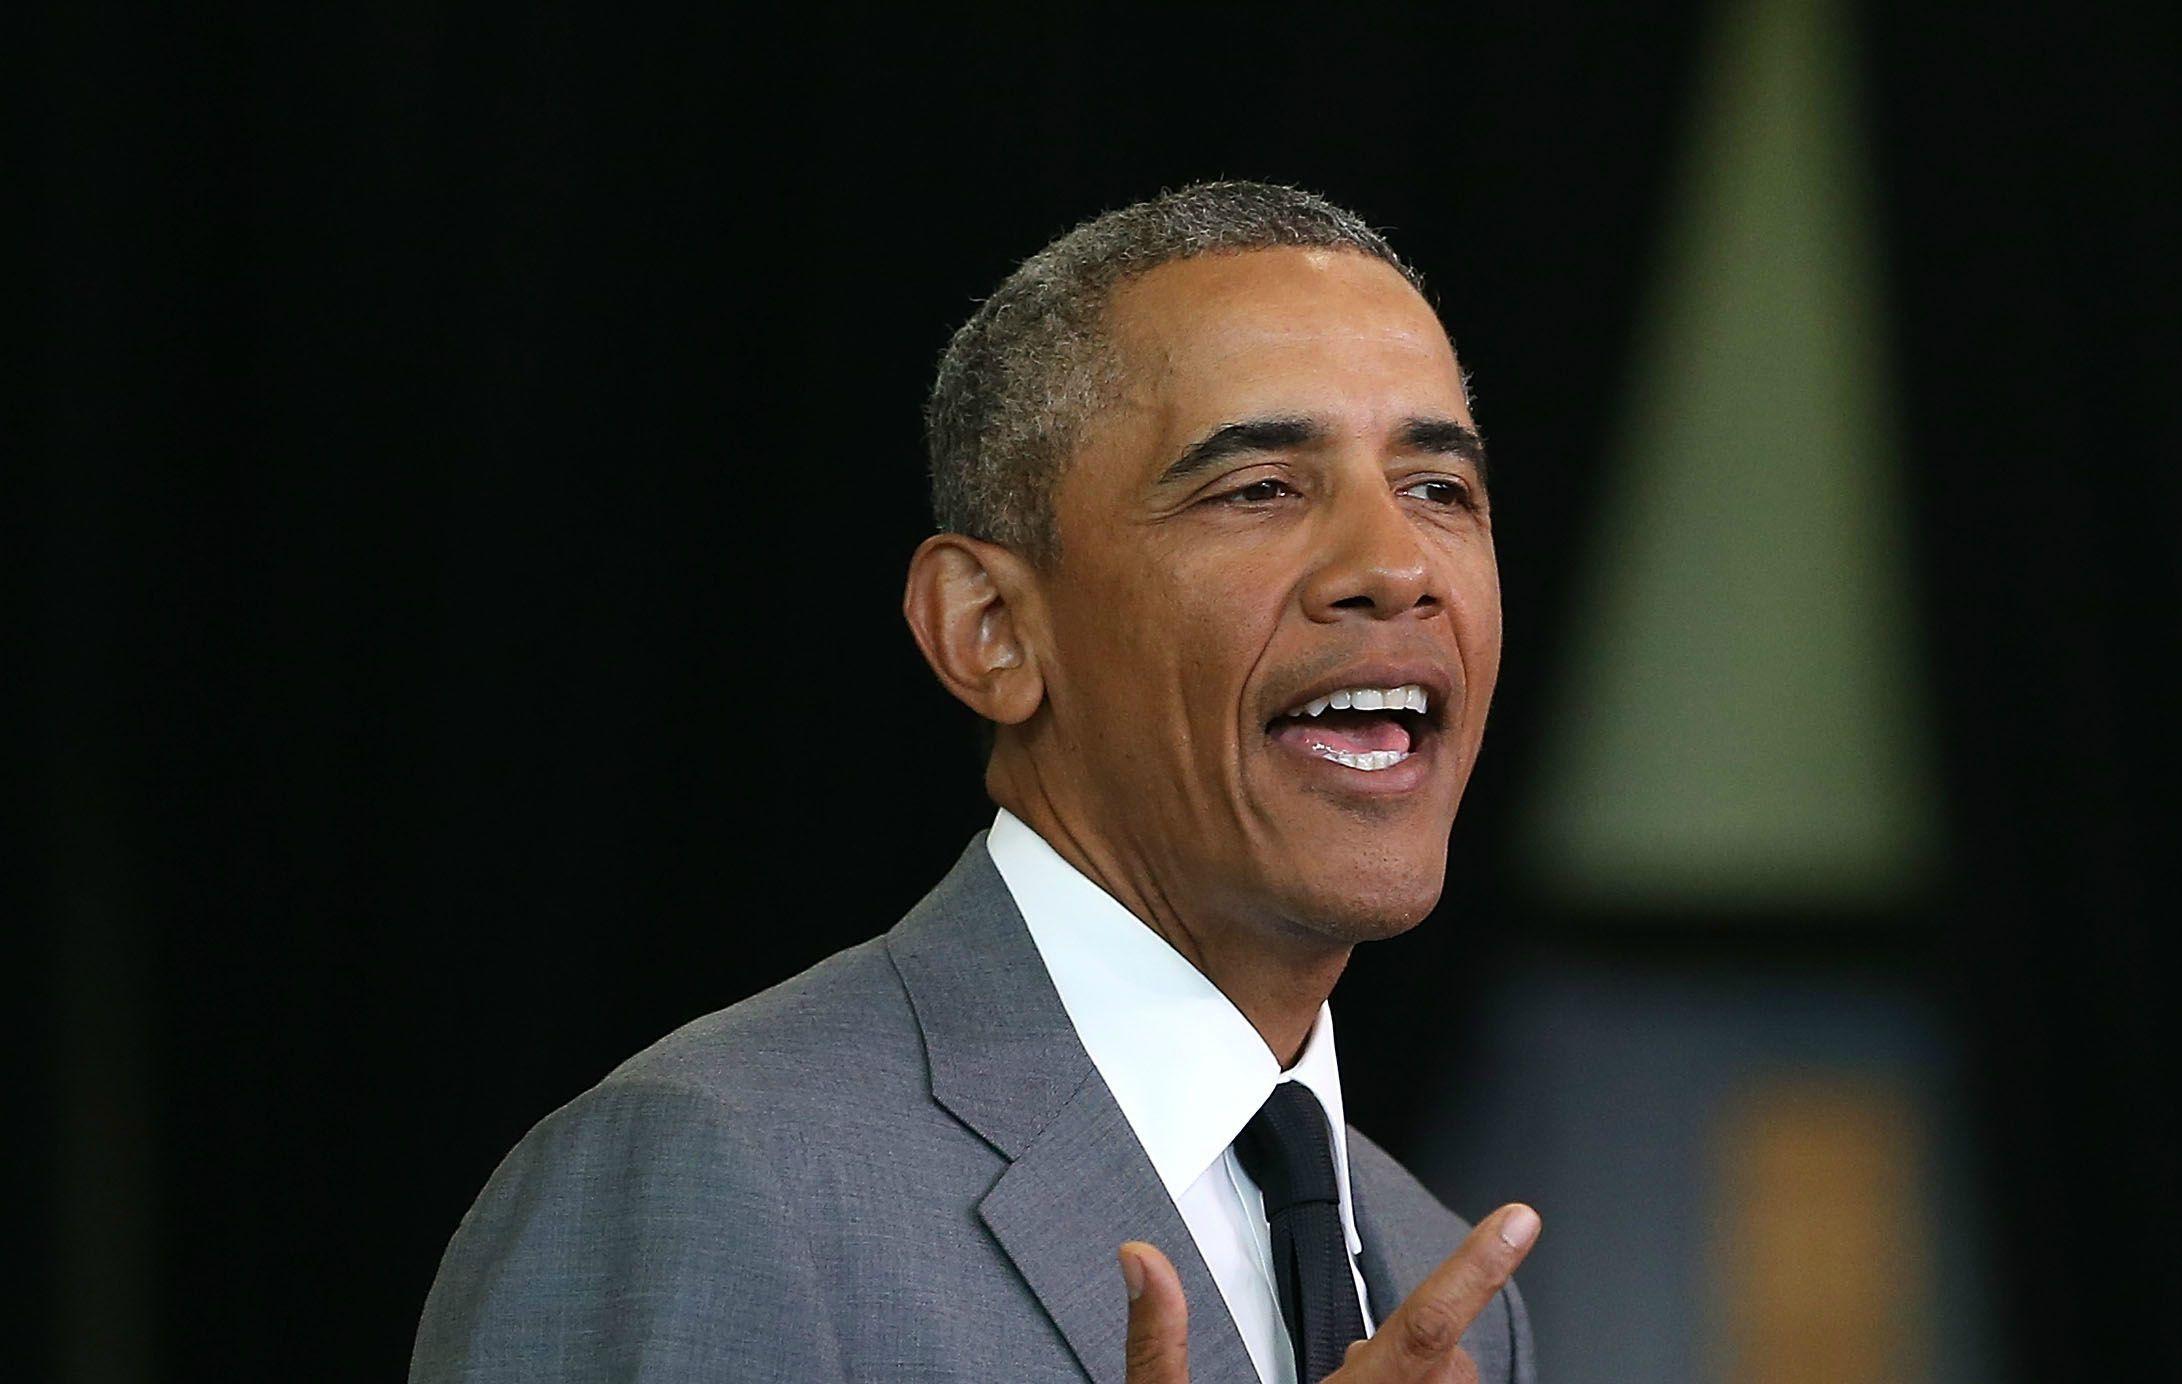 Barack Obama High Quality Wallpapers